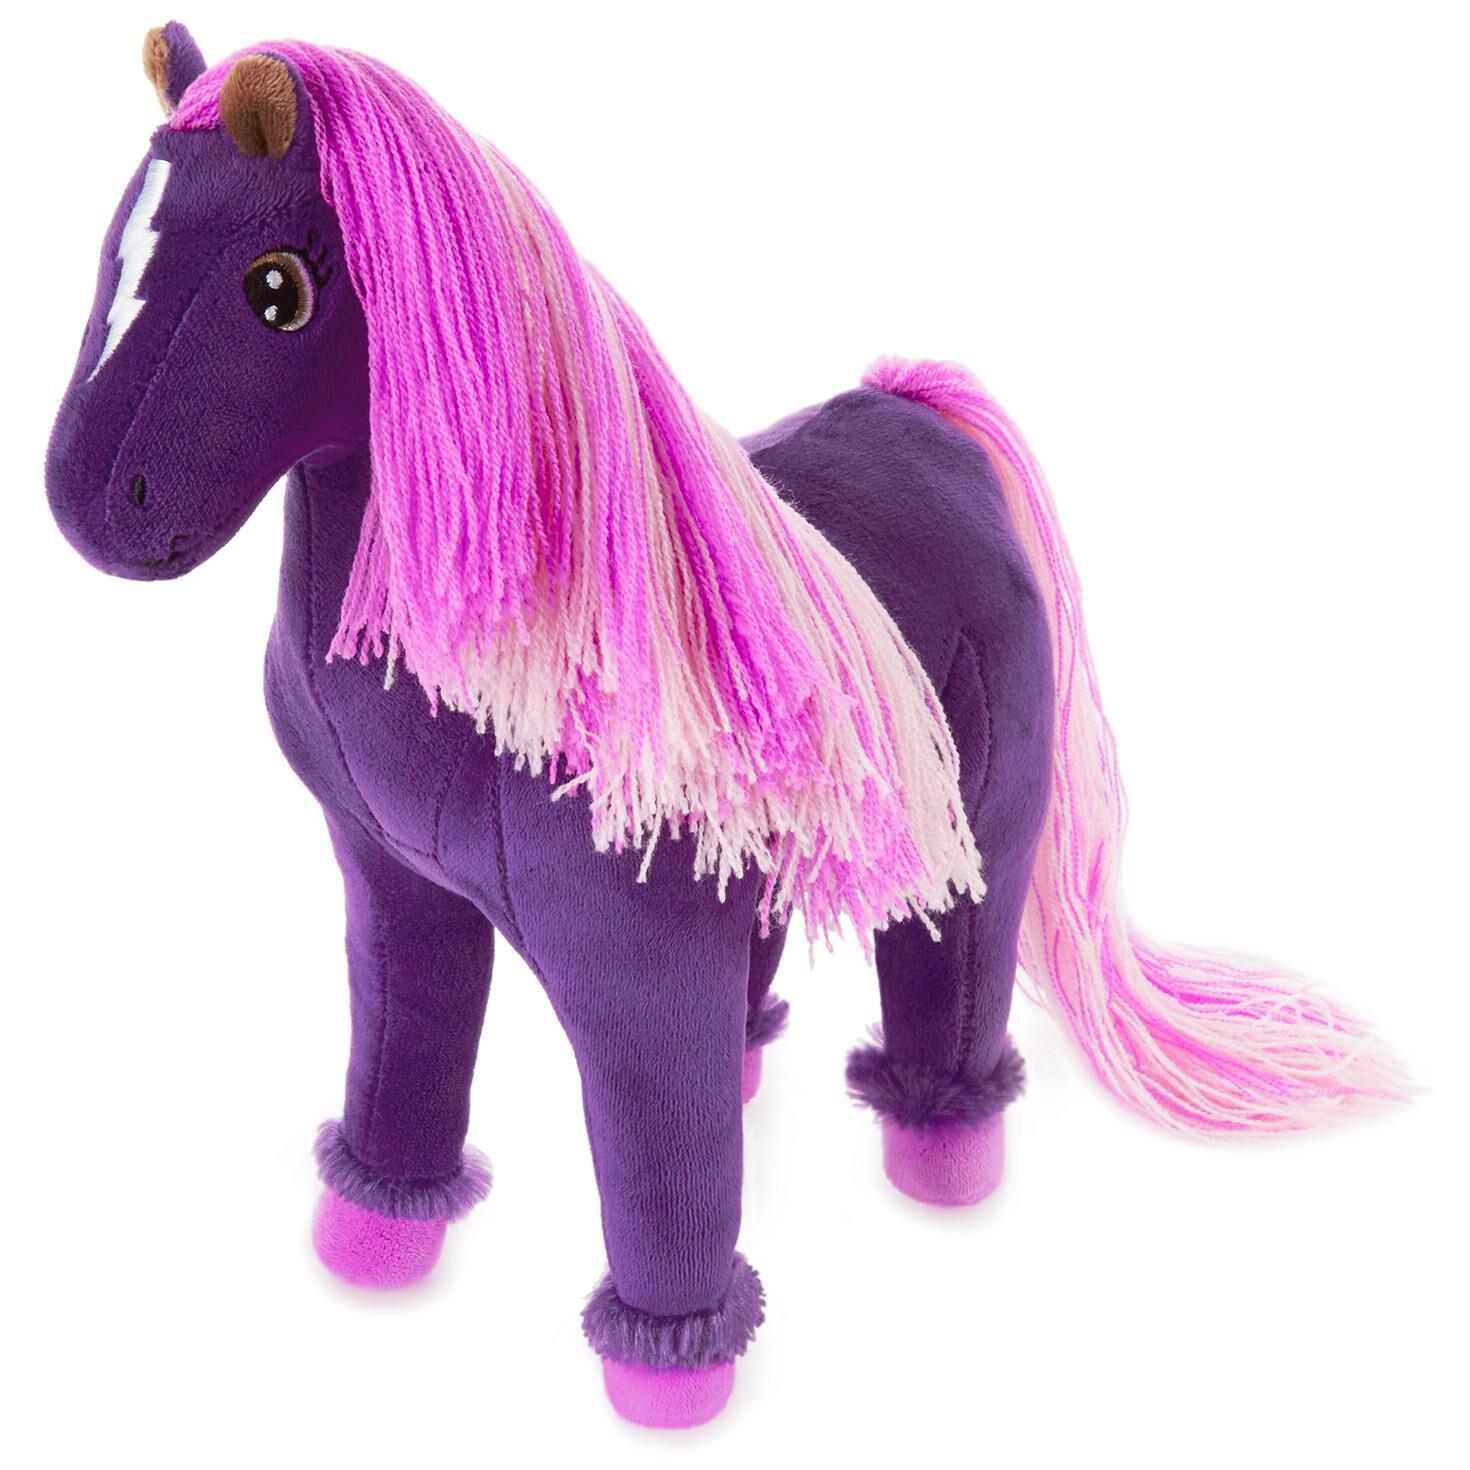 "Rainbow Brite™ Skydancer Horse Stuffed Animal, 11"" - Classic ..."